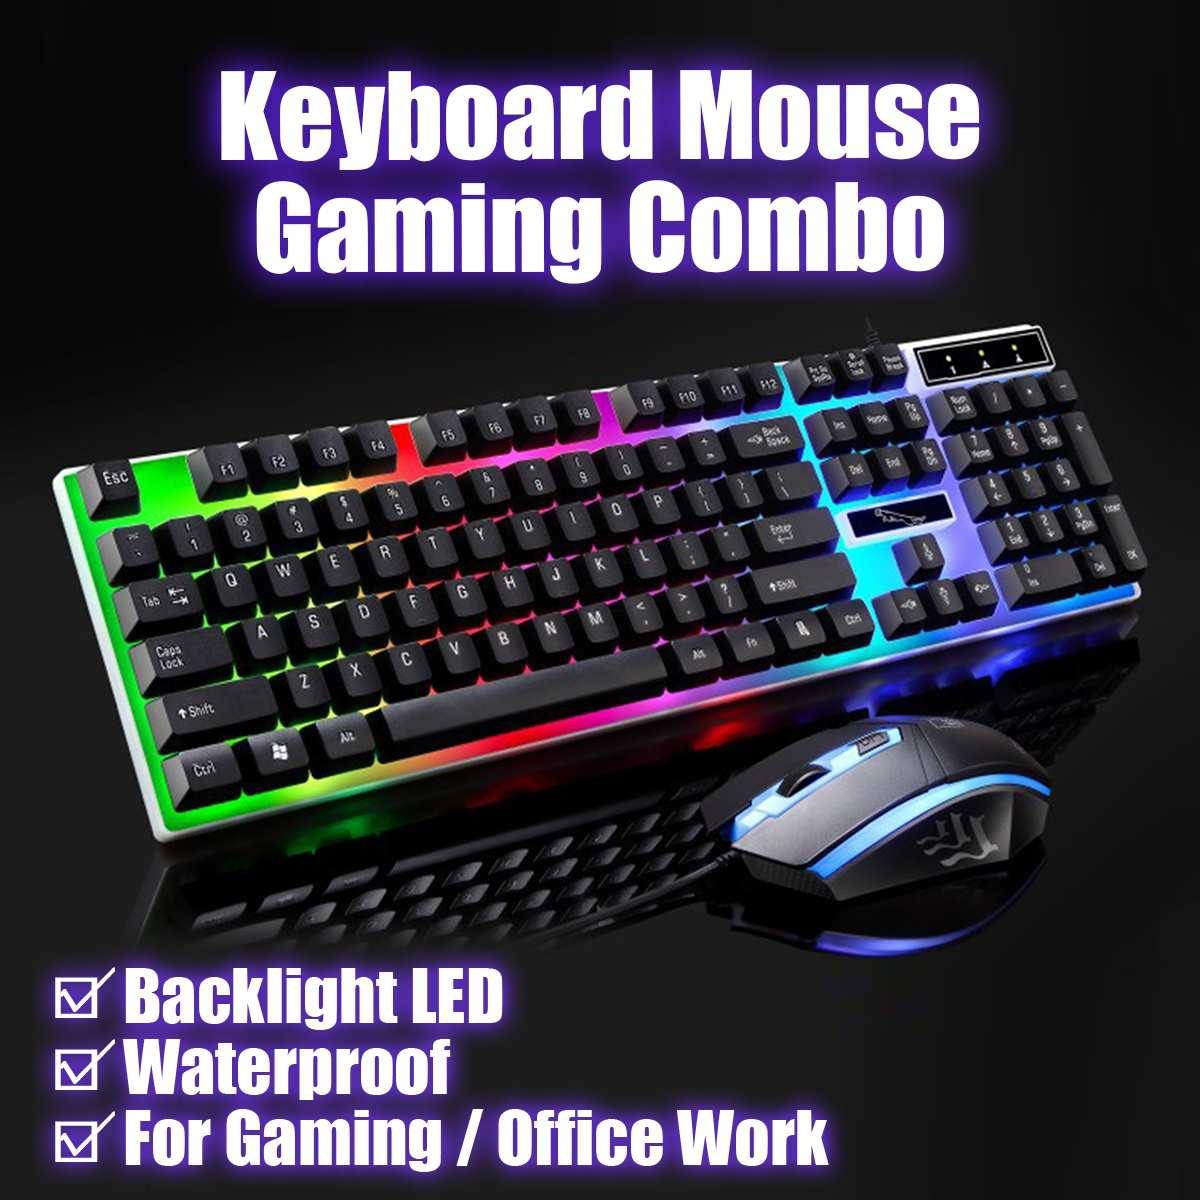 Teclado con cable USB 104, conjunto de ratón, retroiluminación LED para Notebook, ordenador portátil, juegos, PC, TV, suministros de oficina, ratones G21